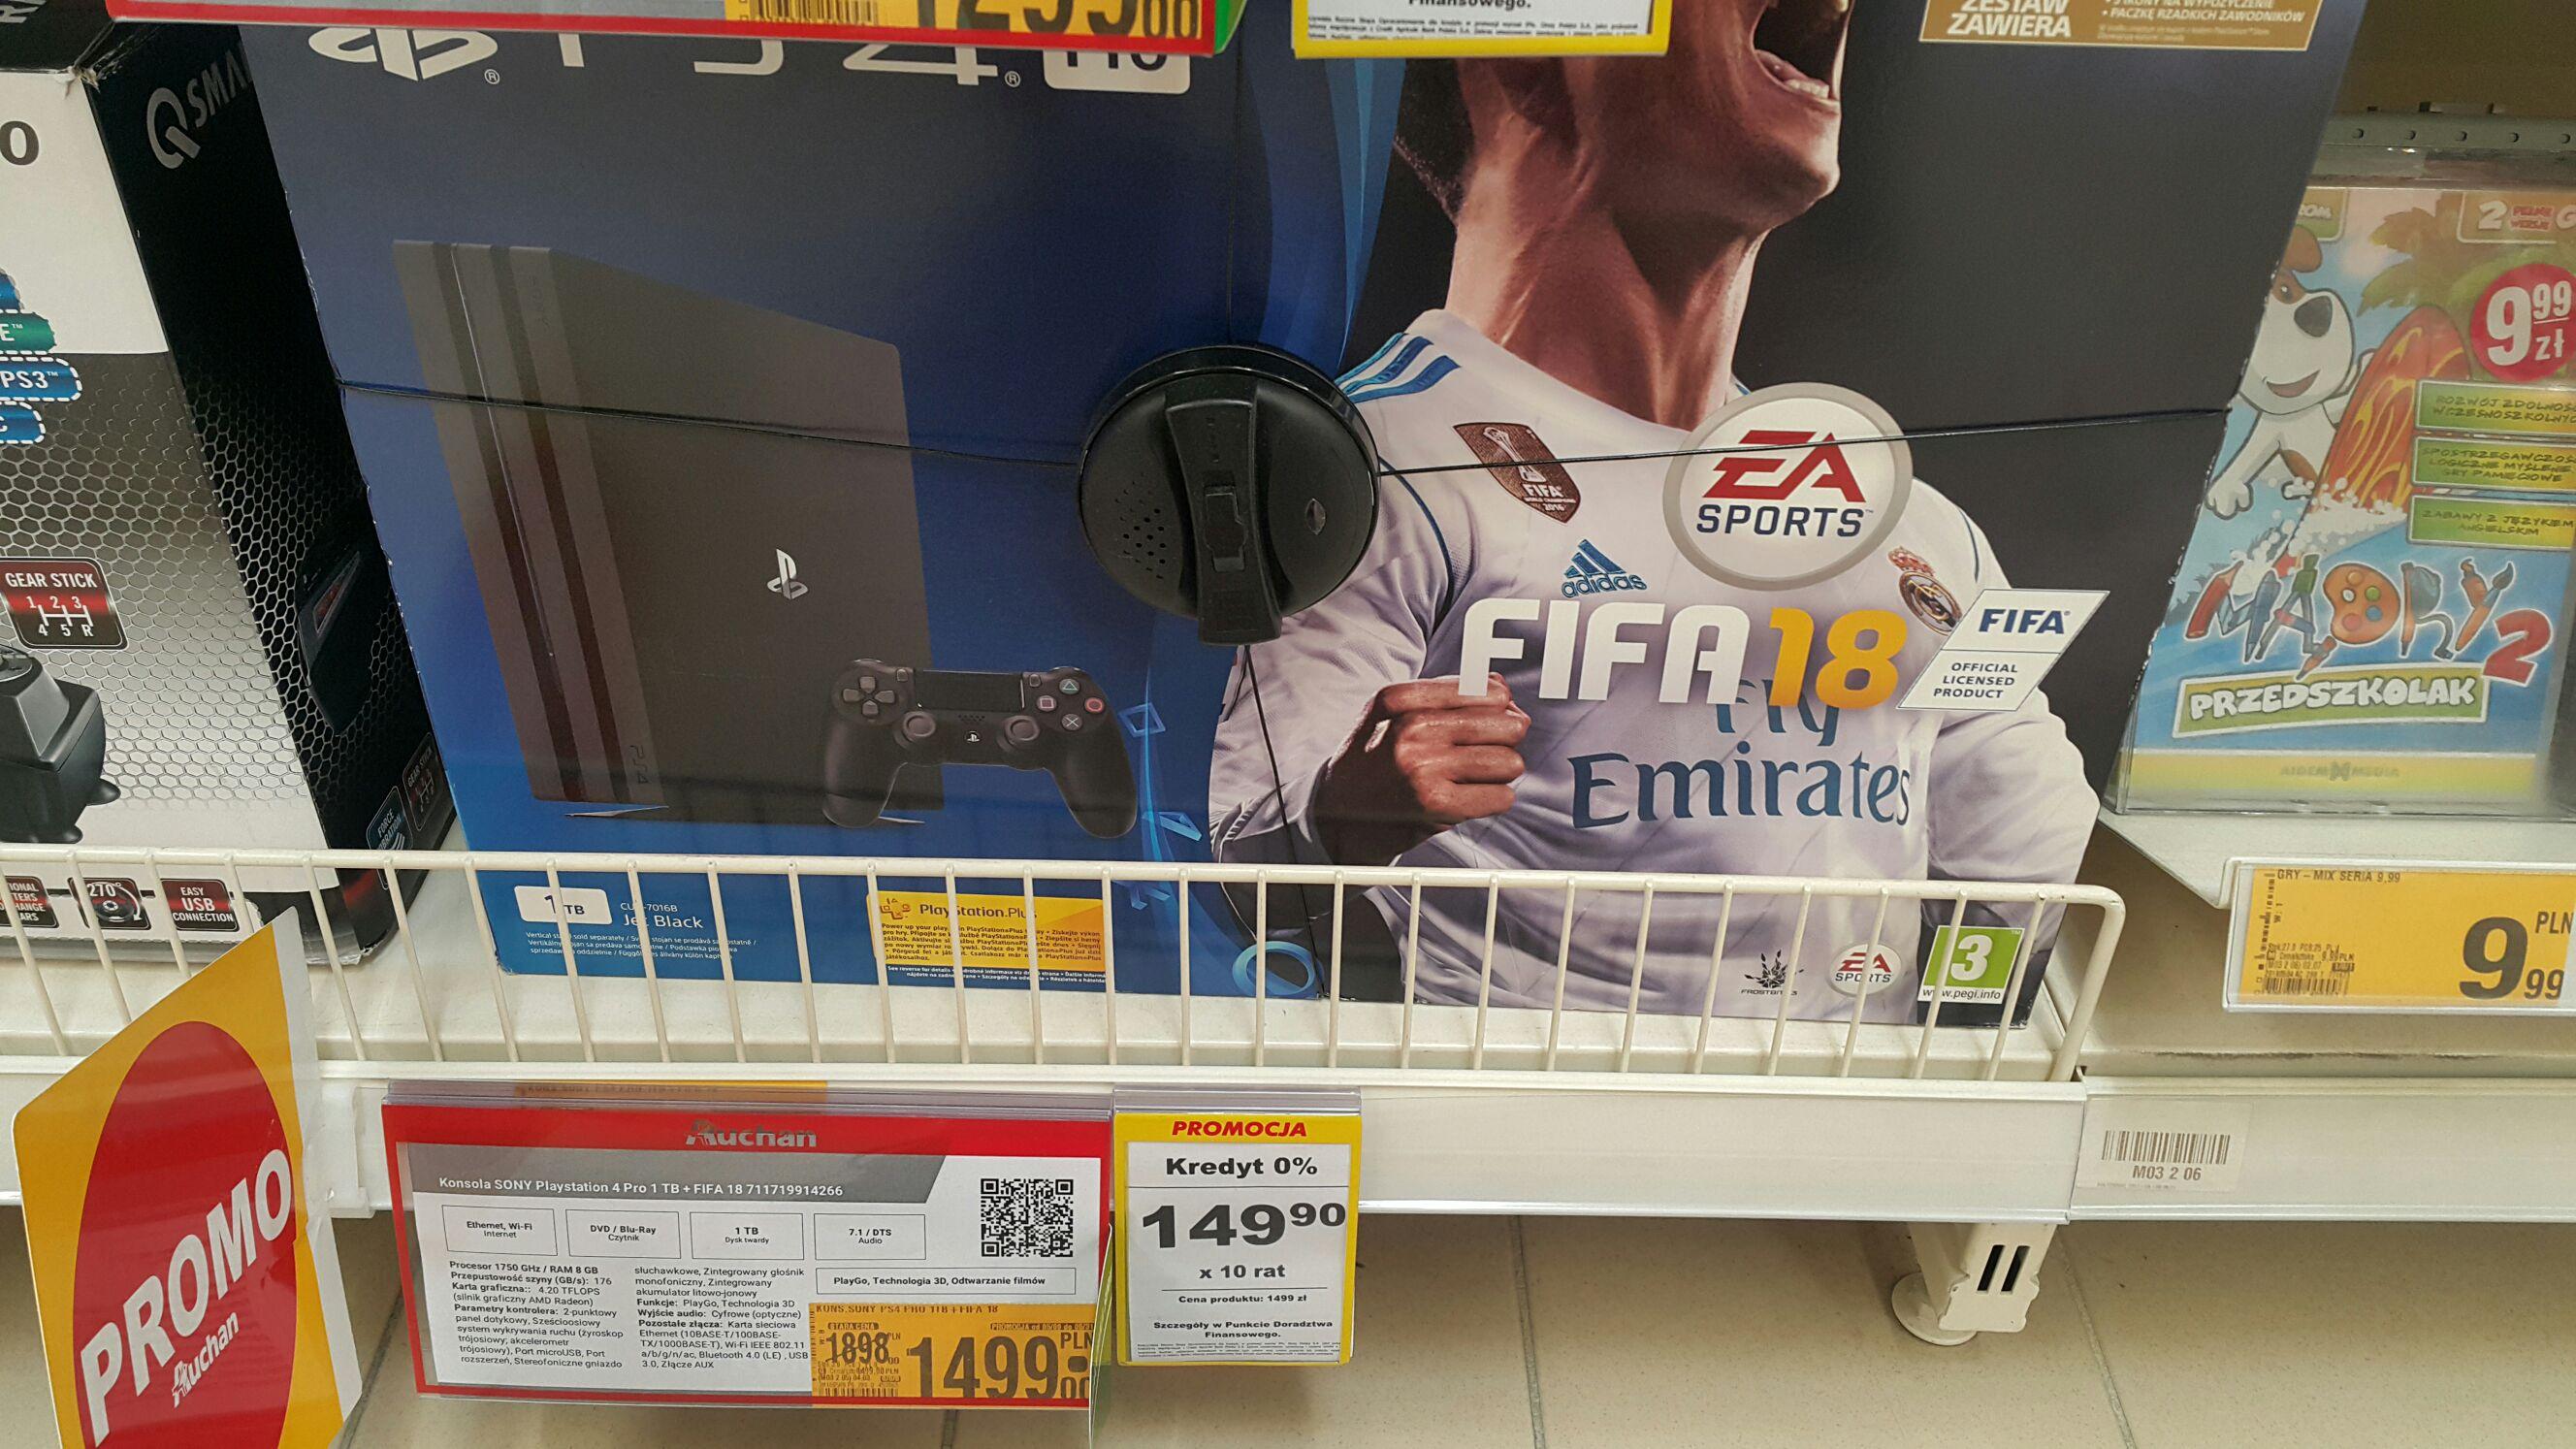 Playstation 4 pro + fifa 18 / Auchan